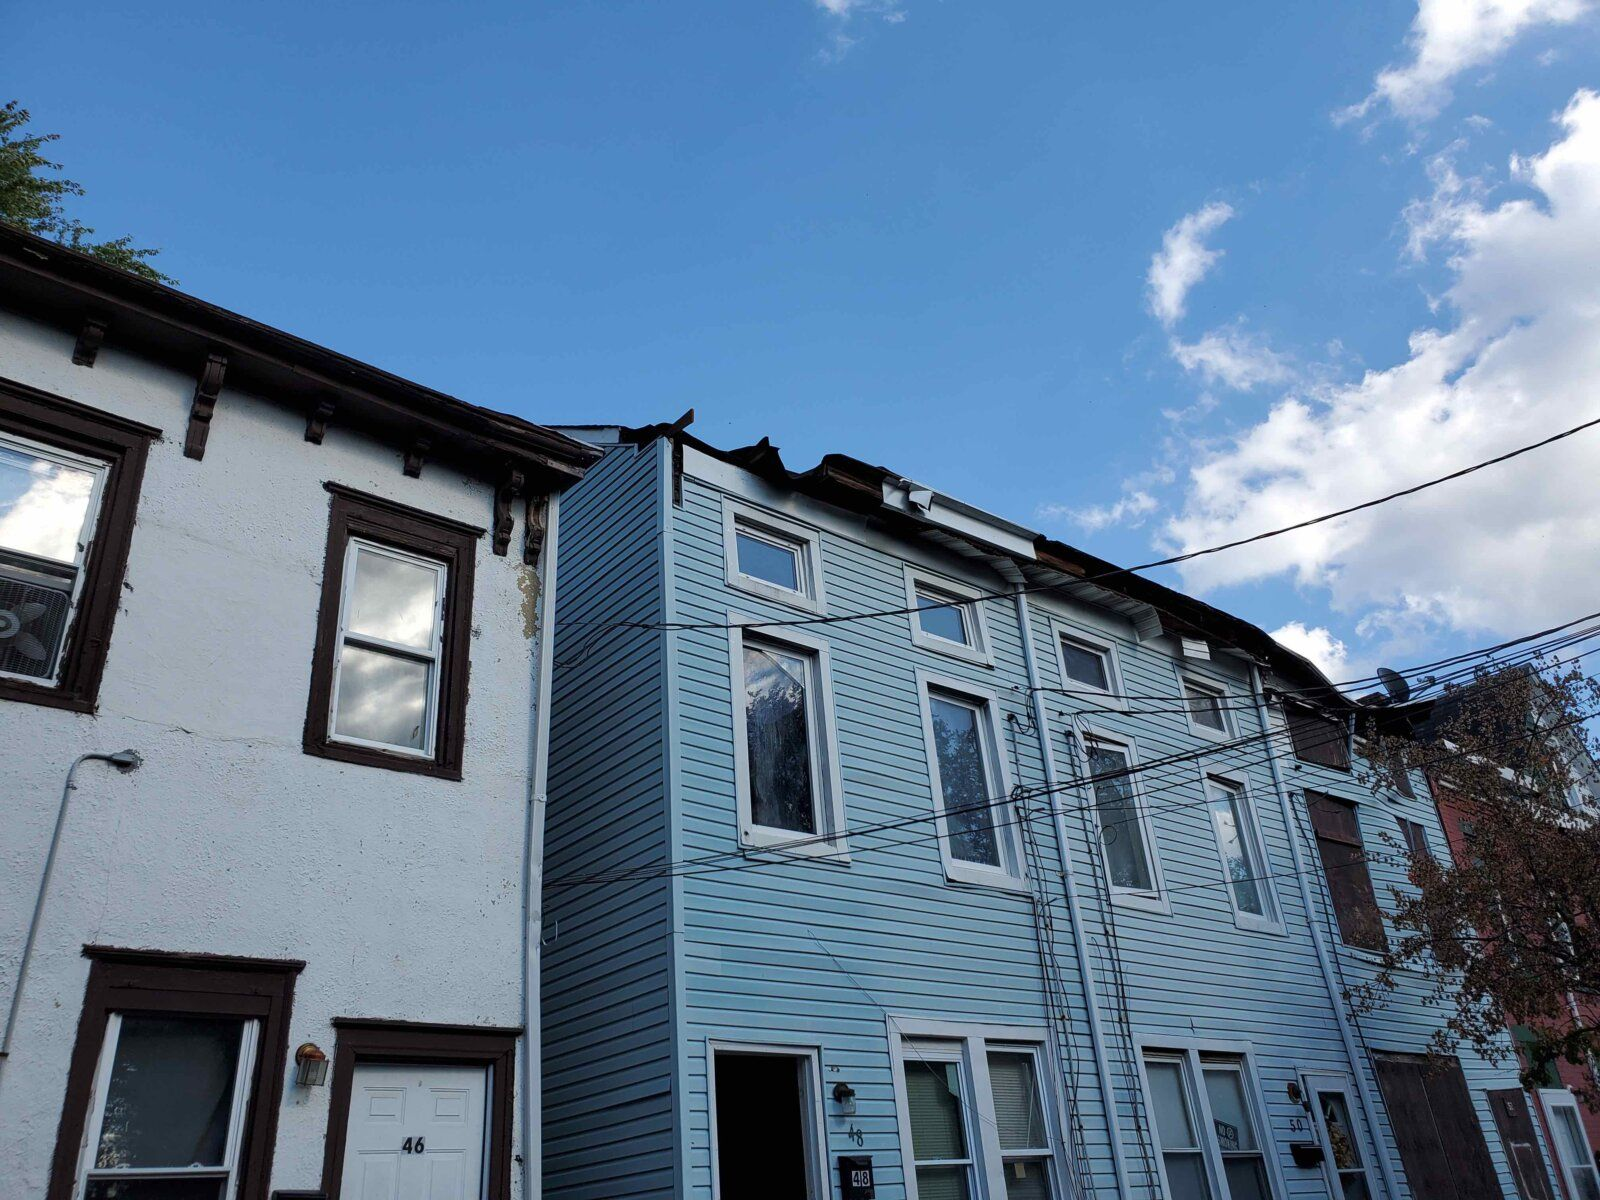 48 Asbury St (Image - 1)